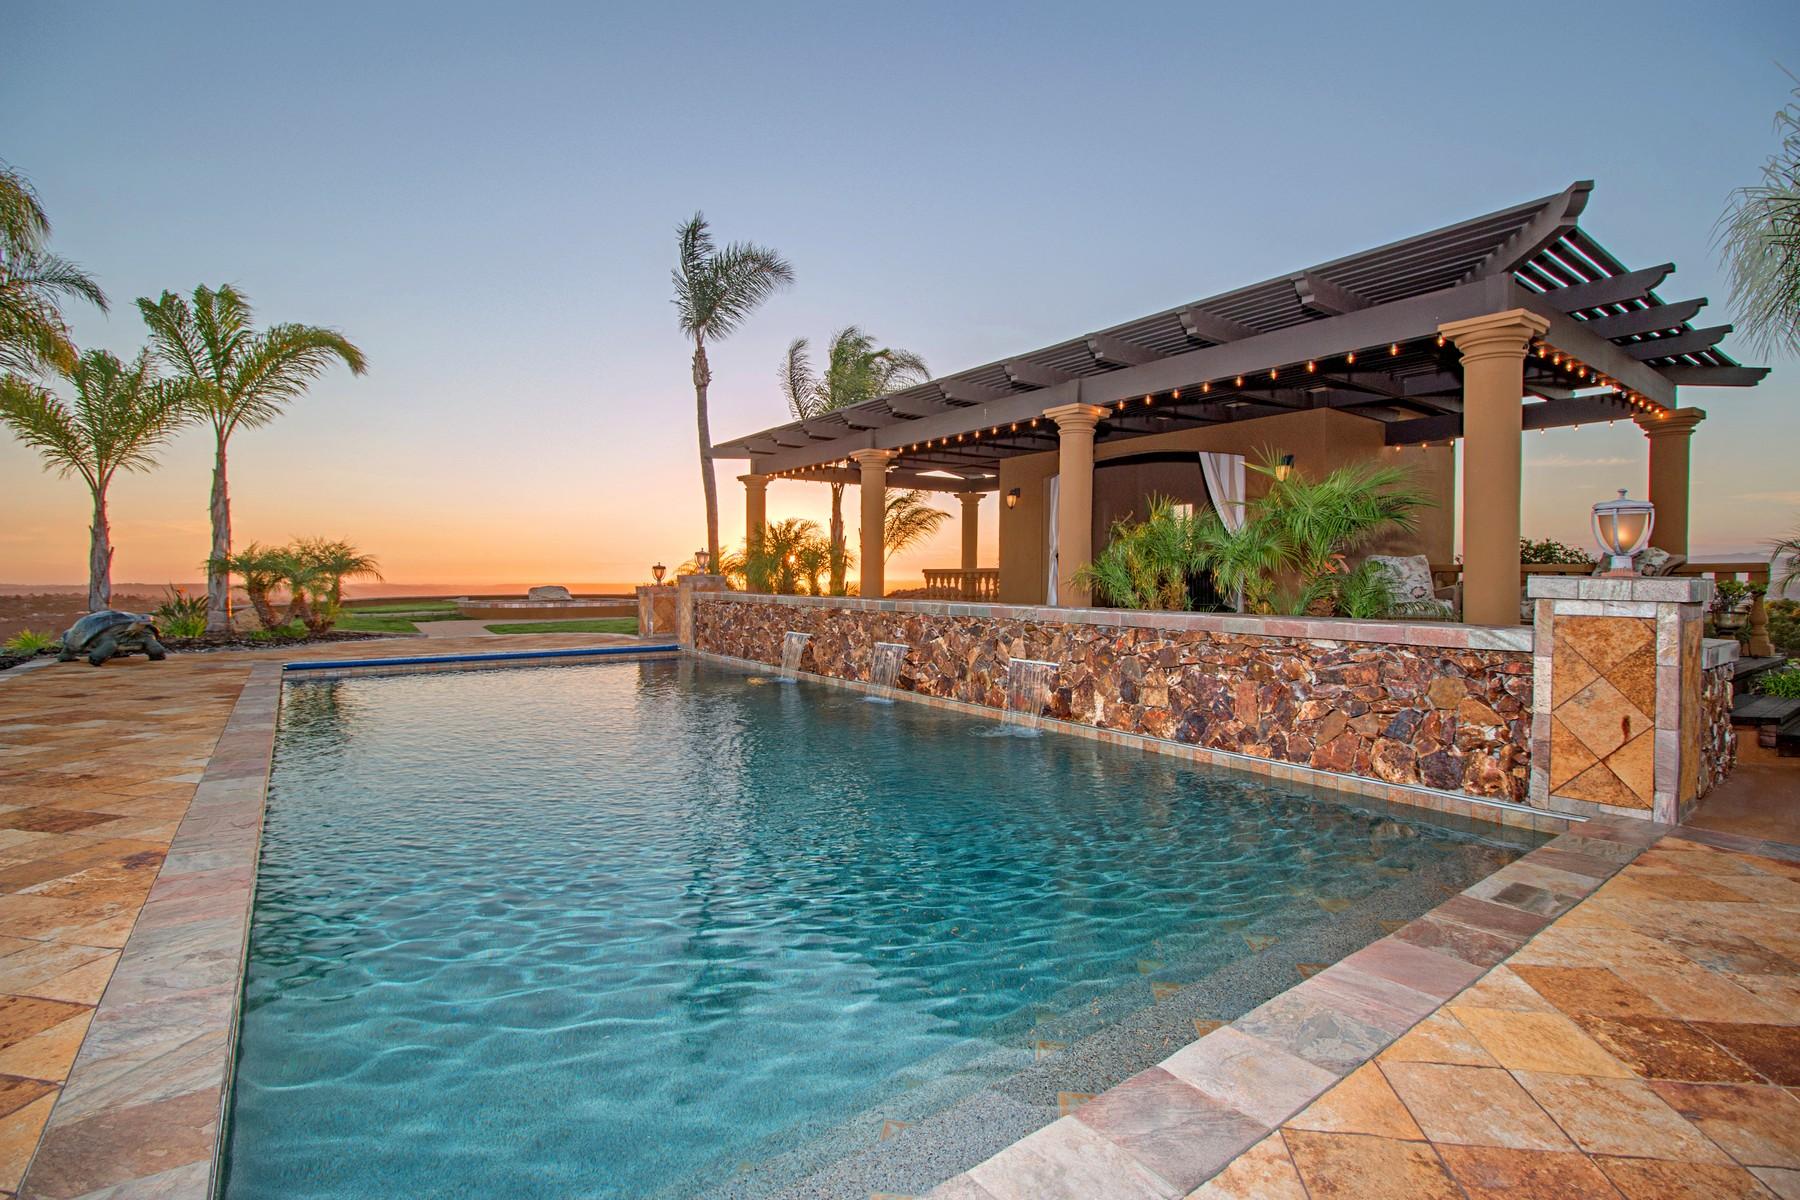 Single Family Home for Sale at 6025 Villa Medici Bonsall, California 92003 United States